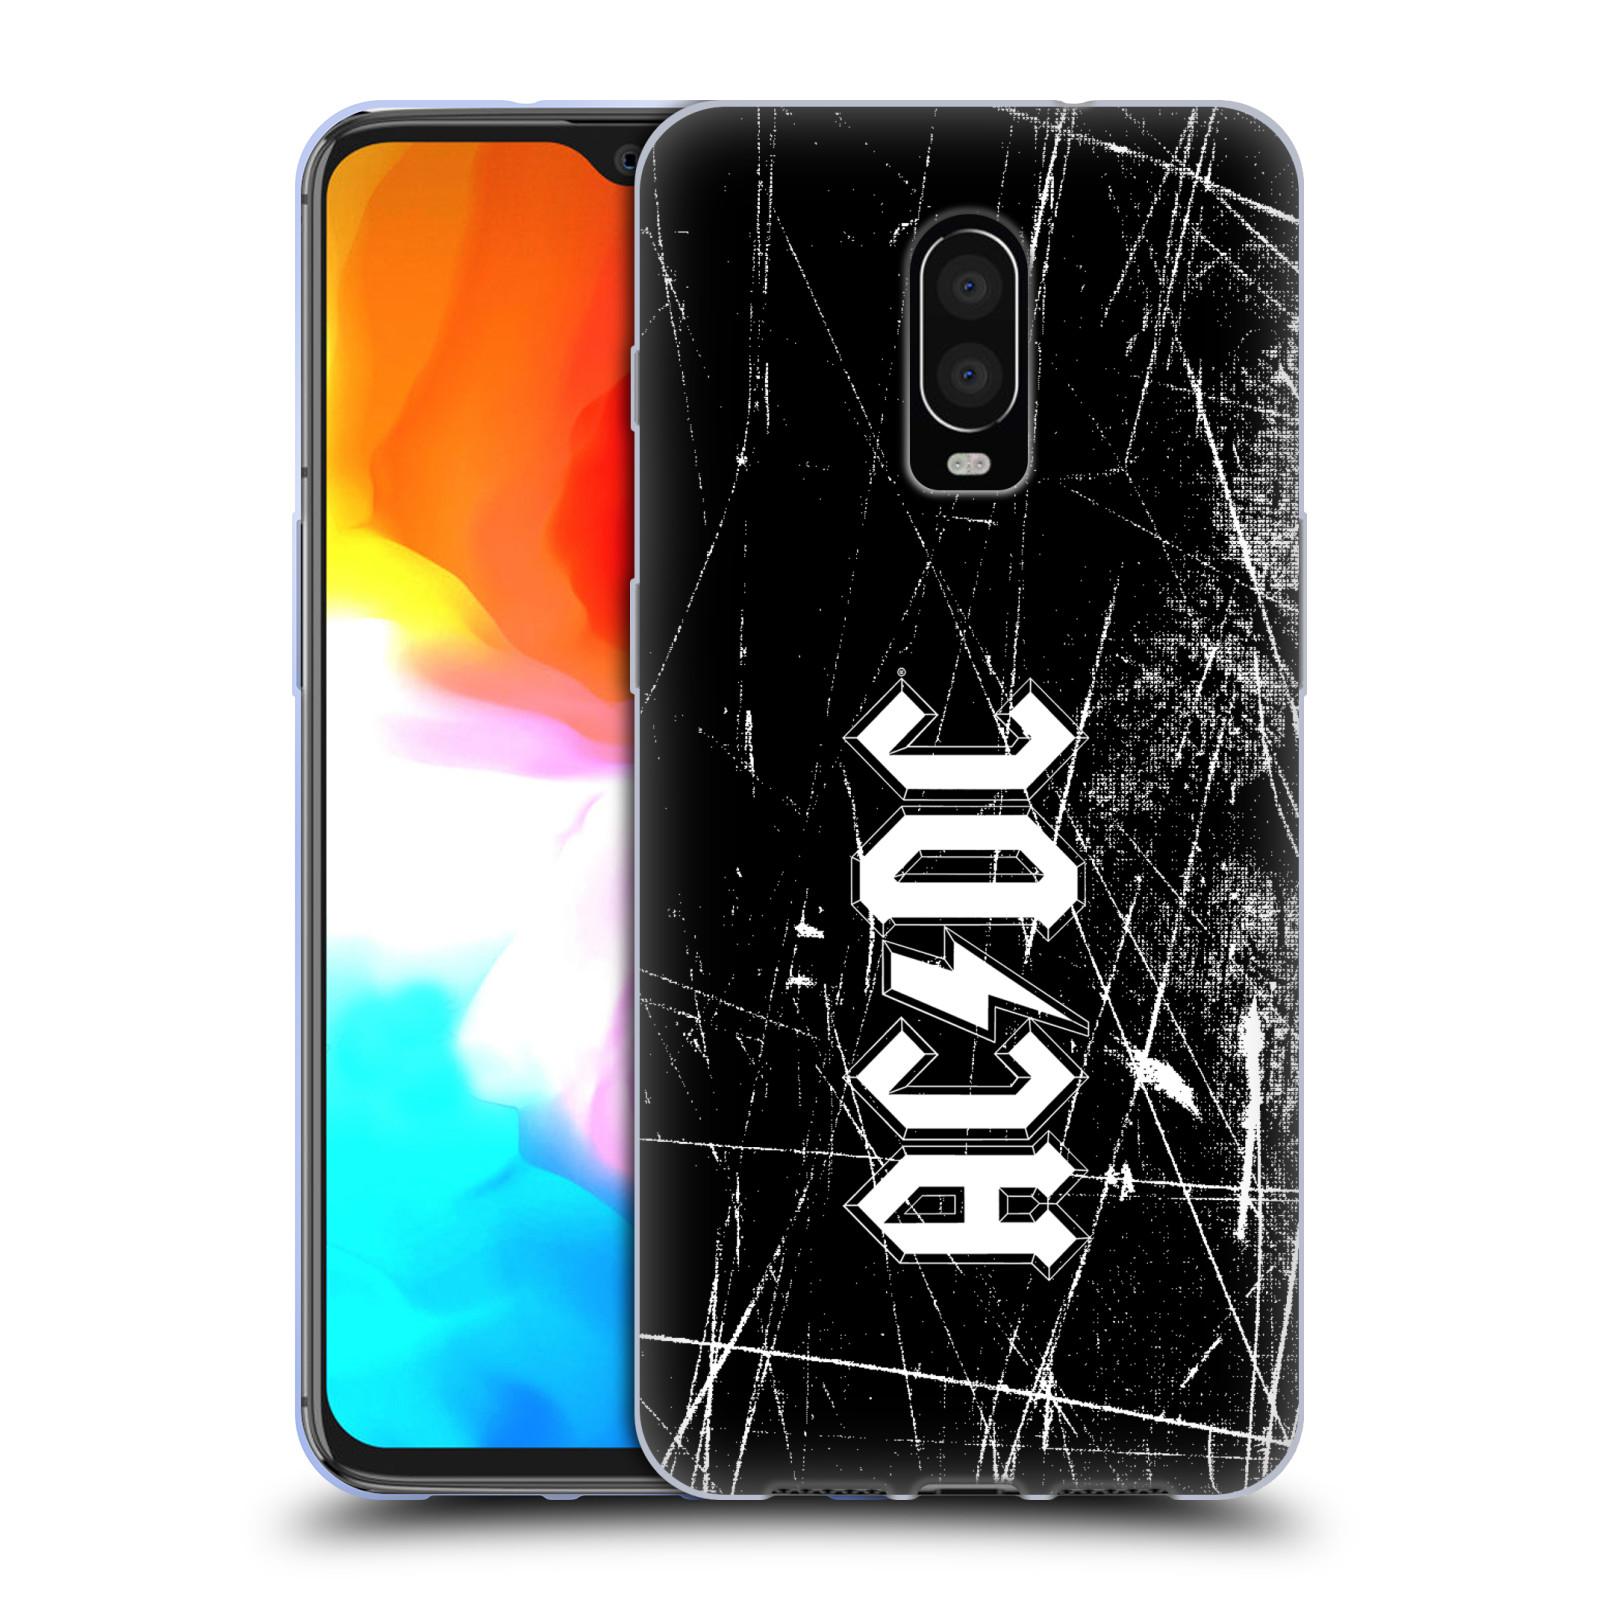 Silikonové pouzdro na mobil OnePlus 6T - Head Case - AC/DC Černobílé logo